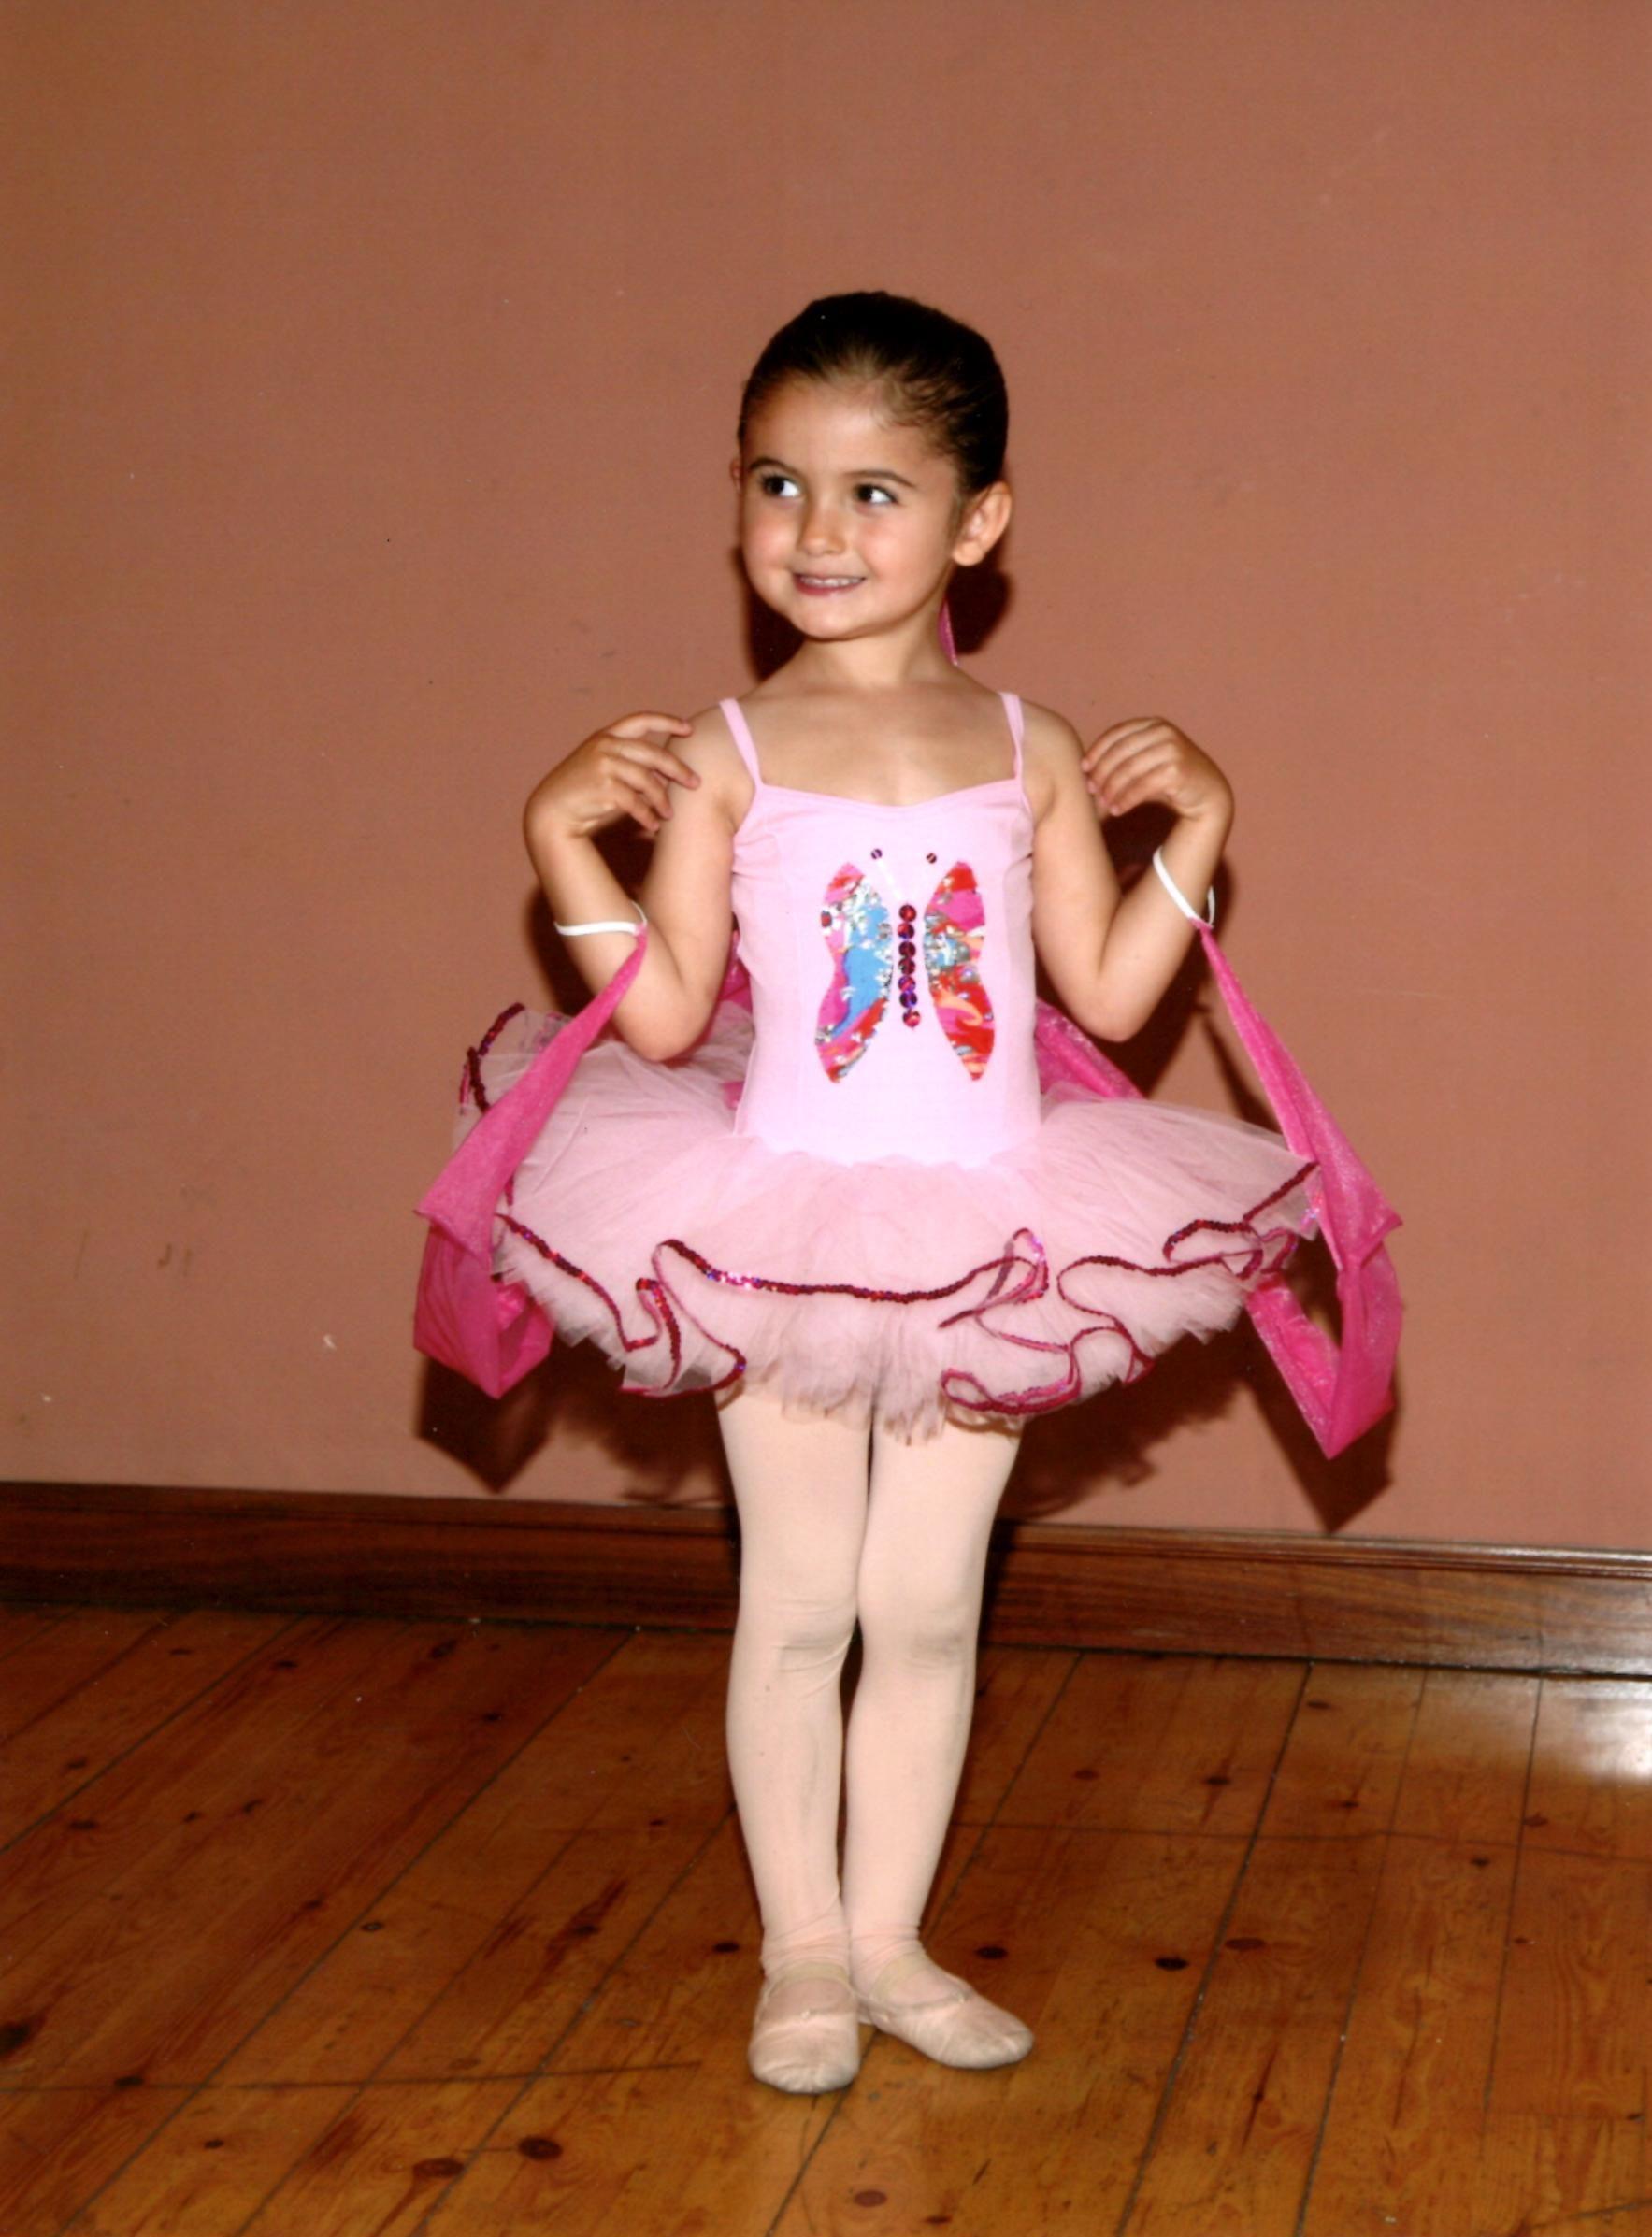 Foto 29 de Escuelas de música, danza e interpretación en Bilbao | Estudio de Ballet Ana Mª Aurrecoechea